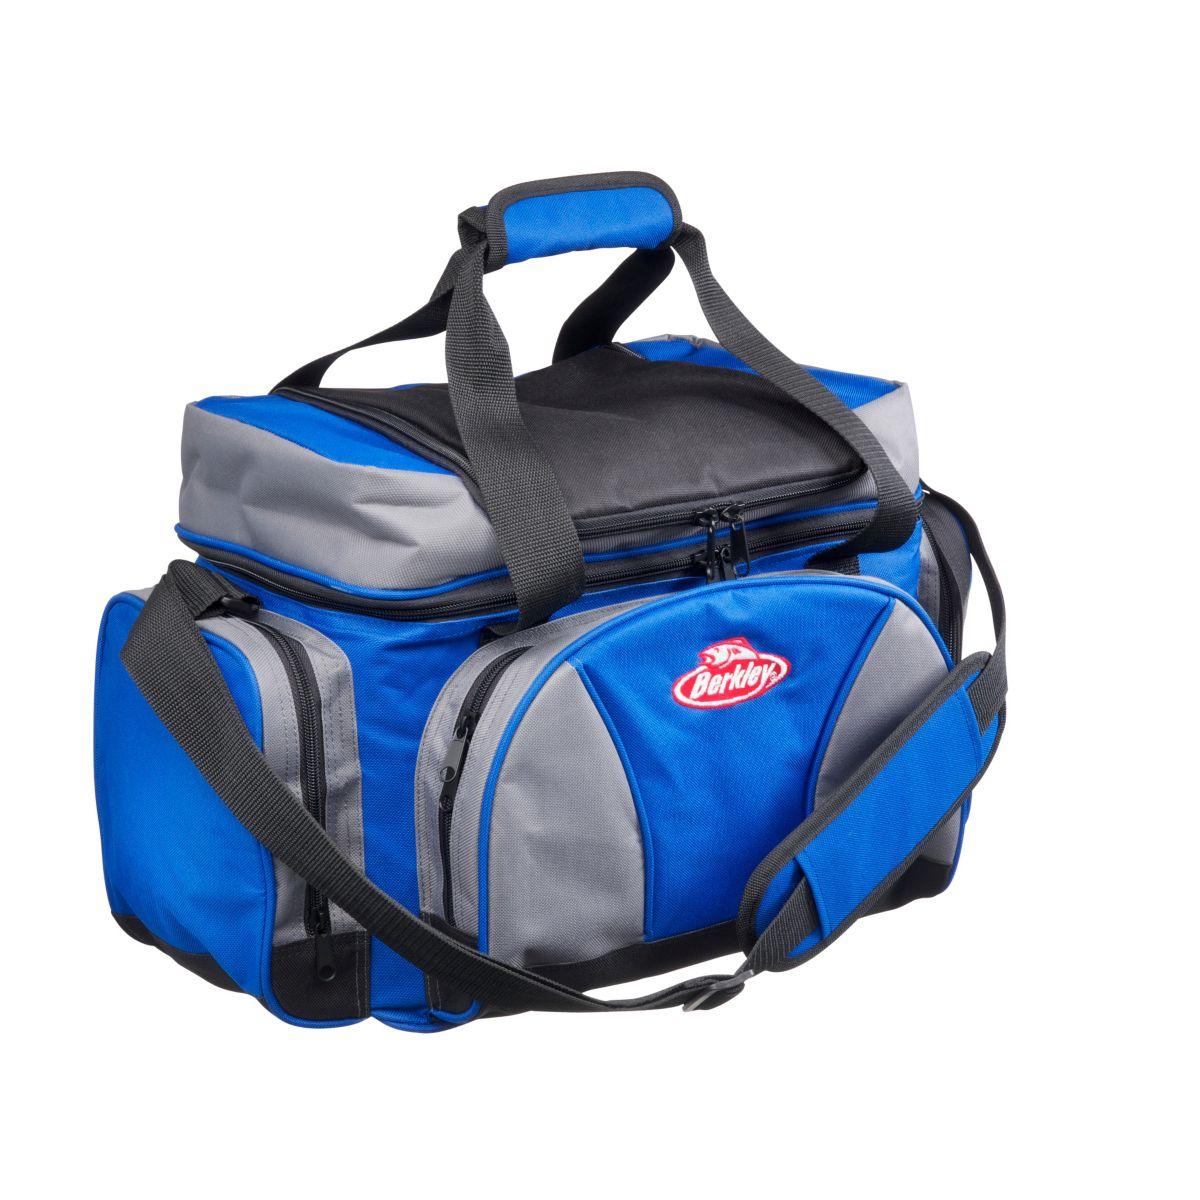 BERKLEY Přívlačová taška s krabičkami Berkley System Bag Blue Grey Black XL